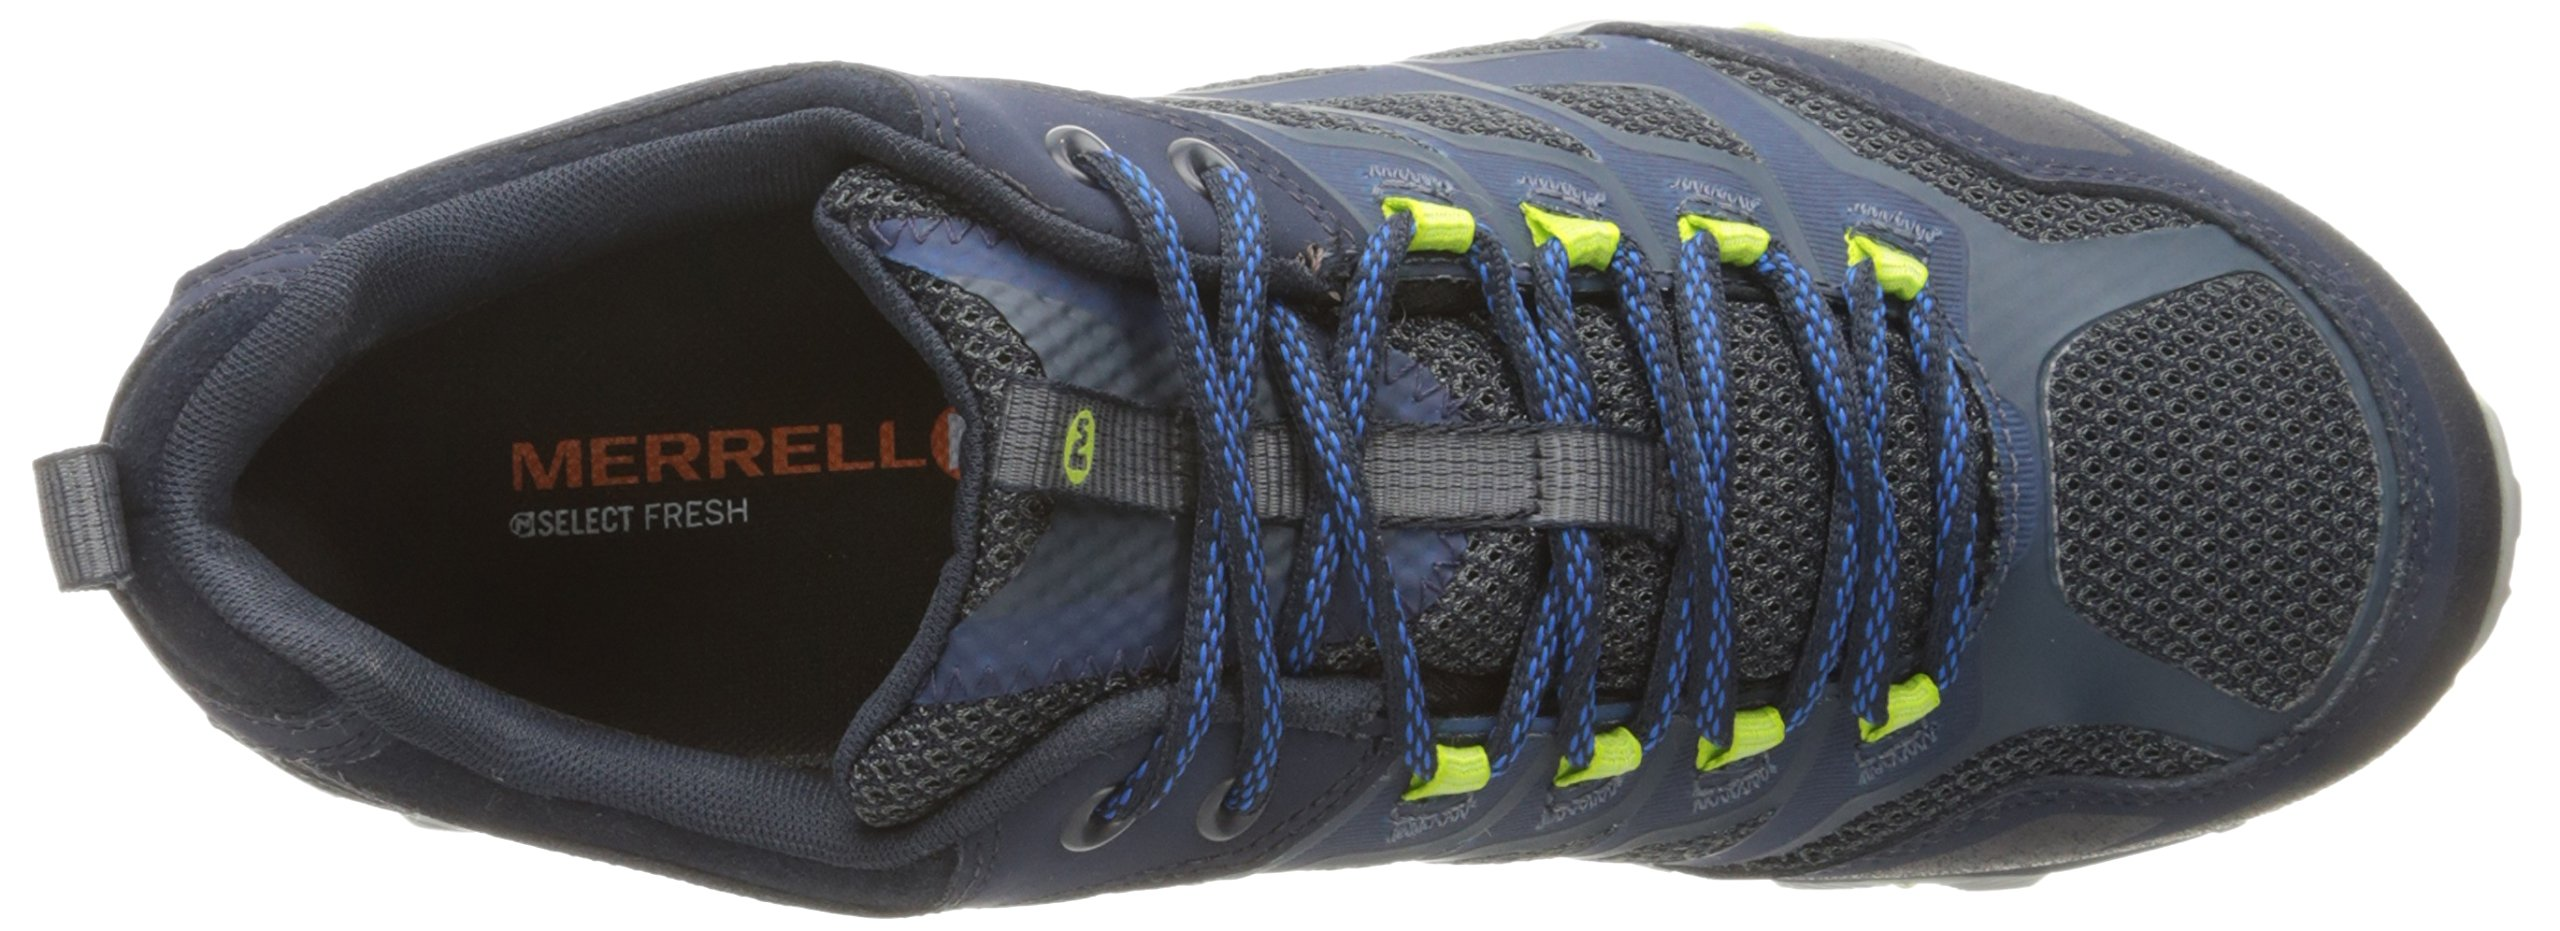 Merrell Men's Moab FST Waterproof Hiking Shoe, Navy, 8 M US by Merrell (Image #7)